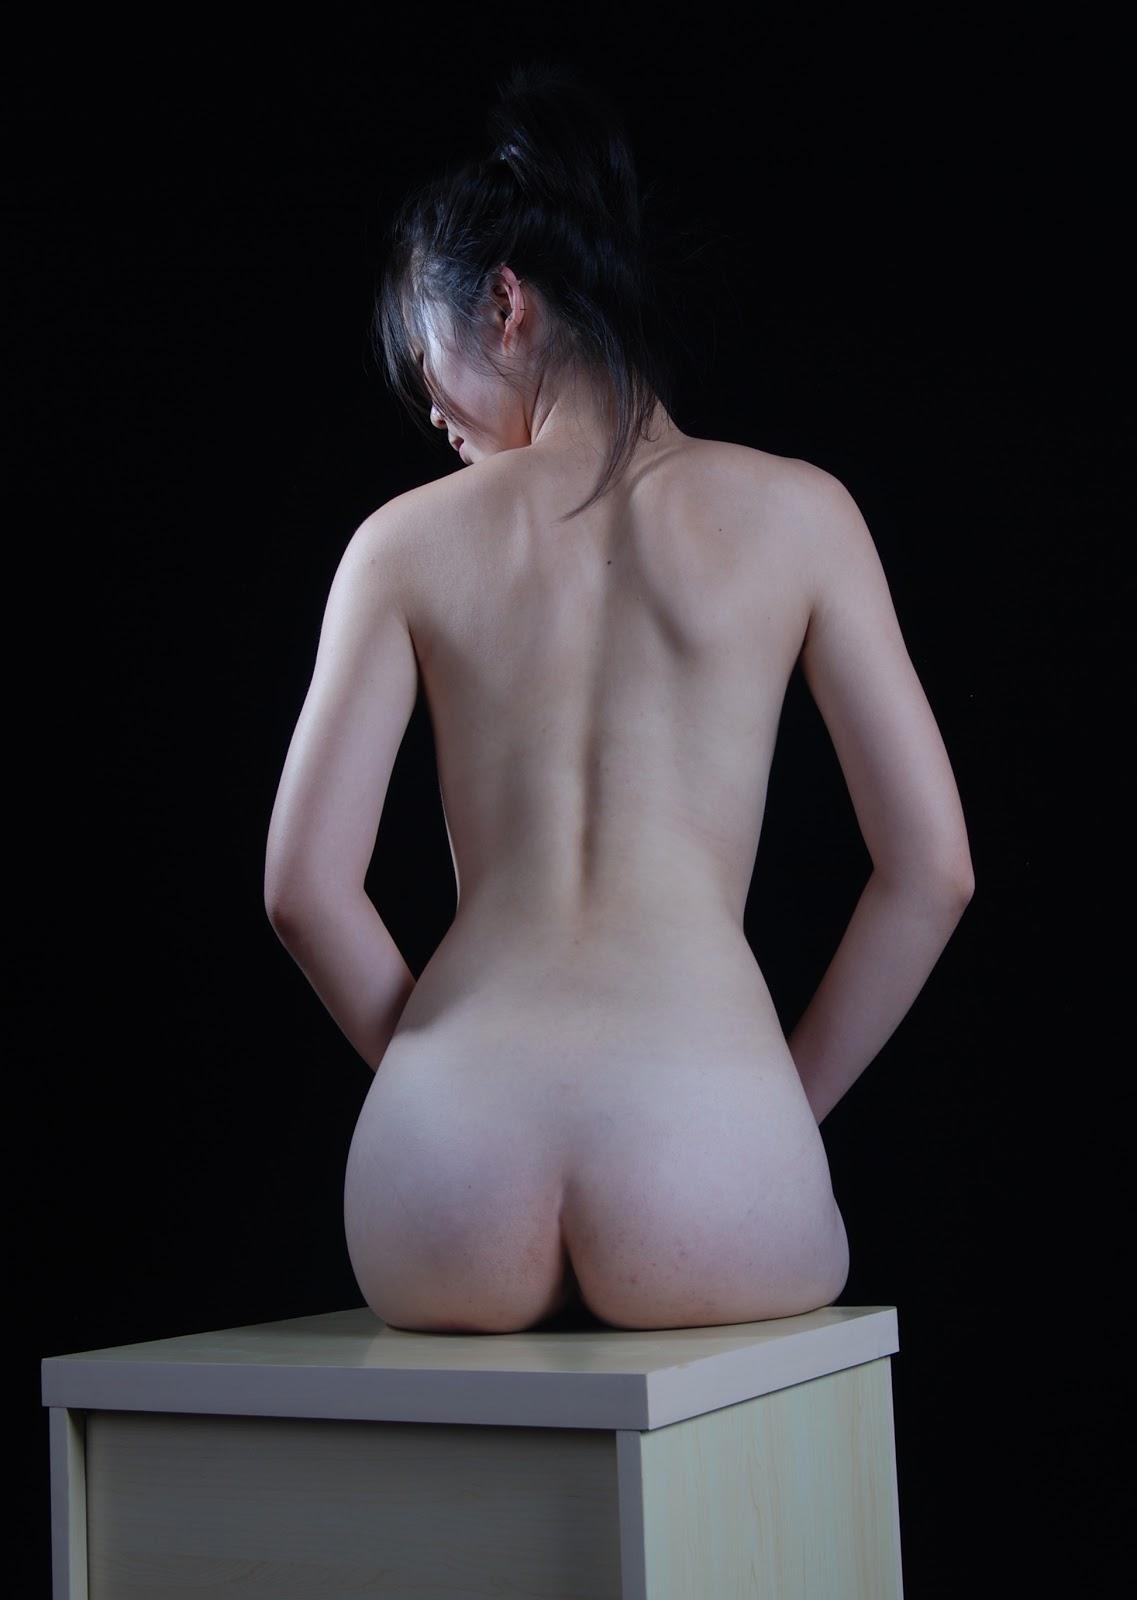 Chinese Nude_Art_Photos_-_289_-_YuTing_Vol_1.rar chinese 07040